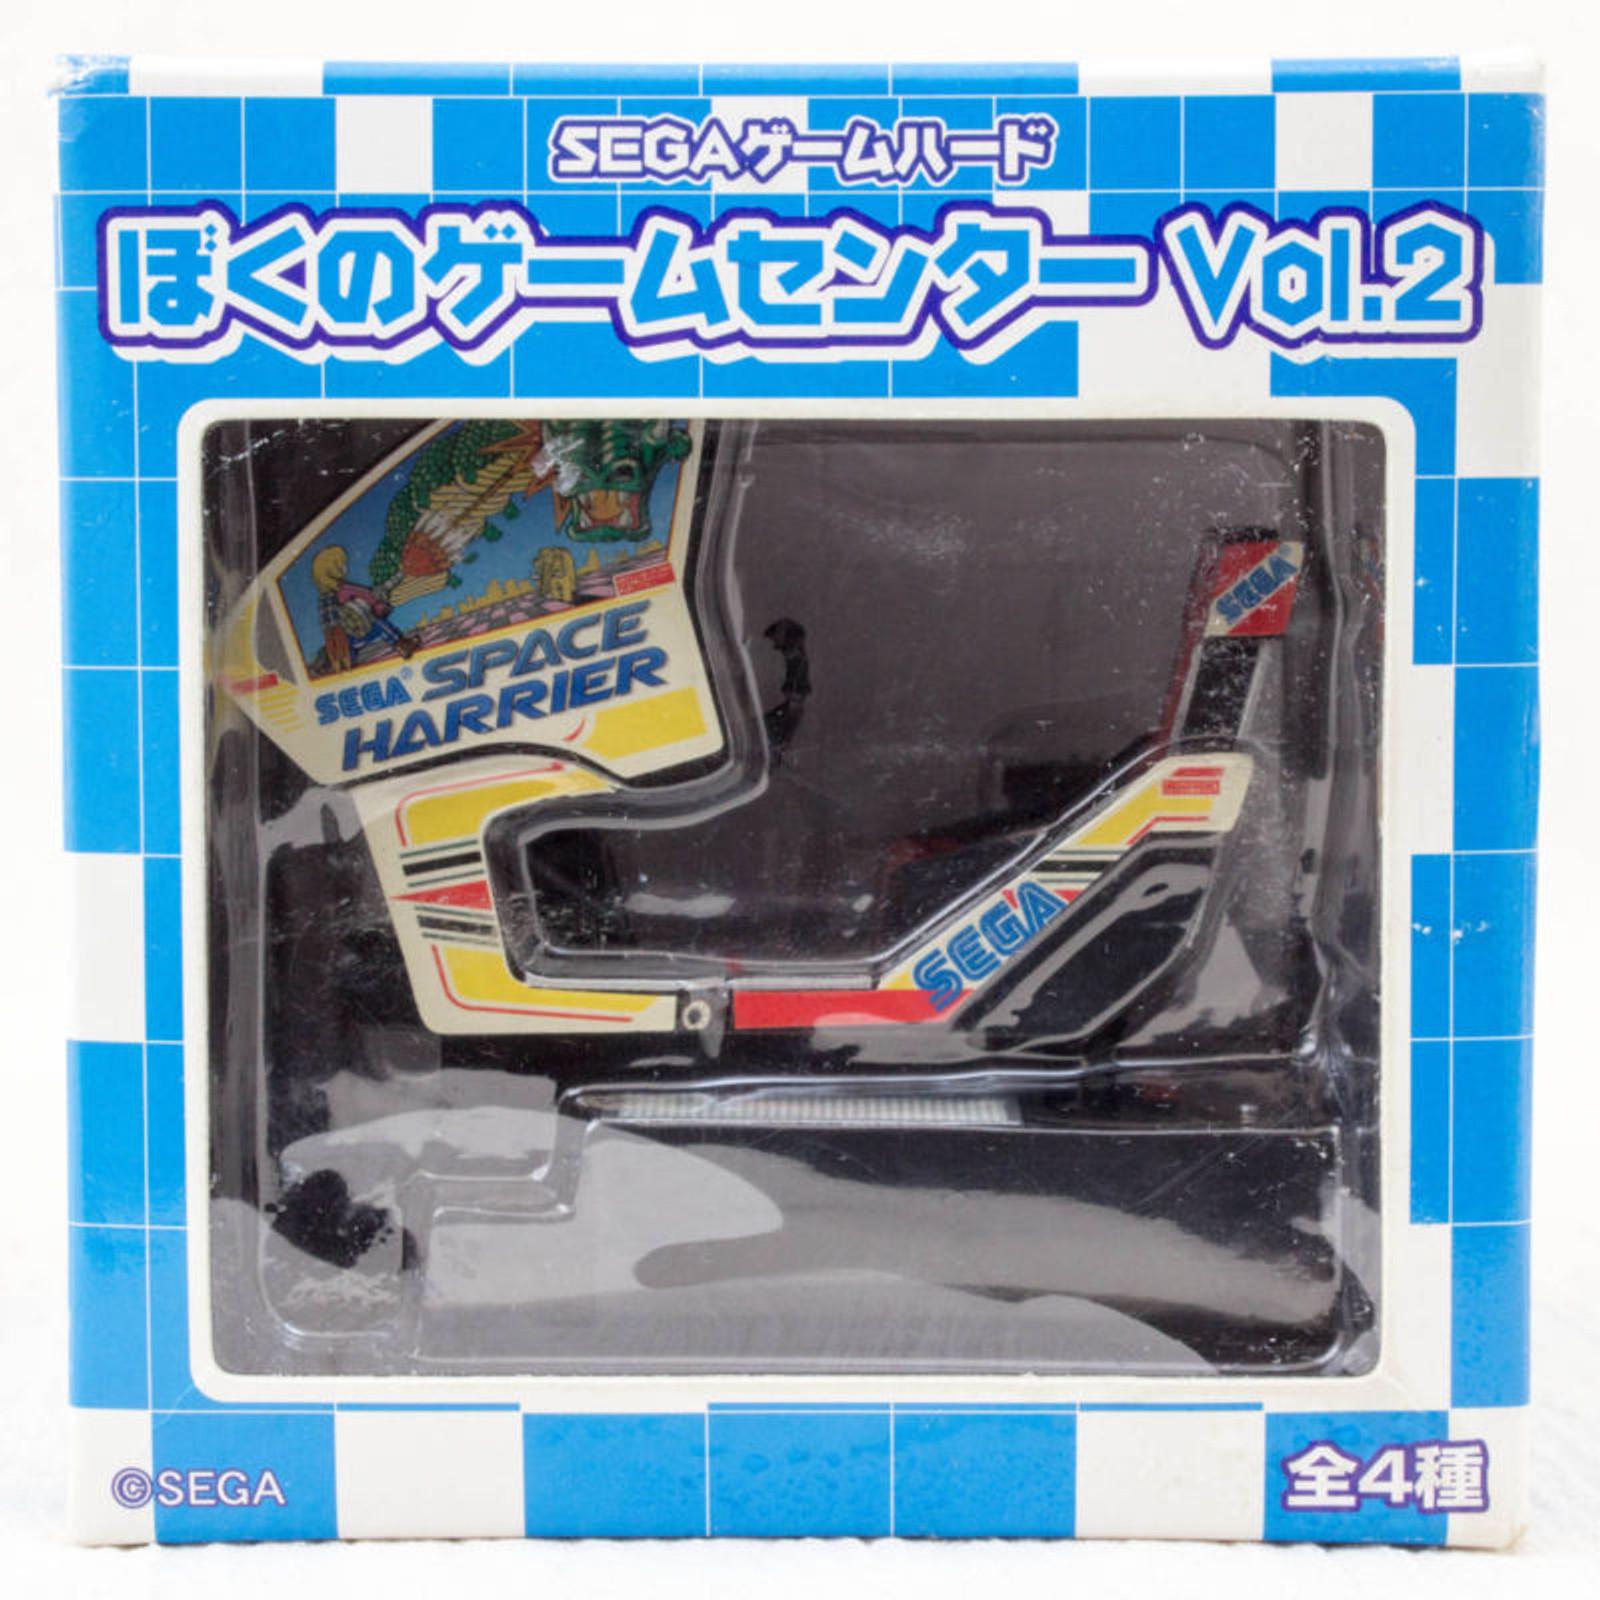 RARE!! Boku no My Game Center Vol.2 Space Harrier Miniature Figure SEGA